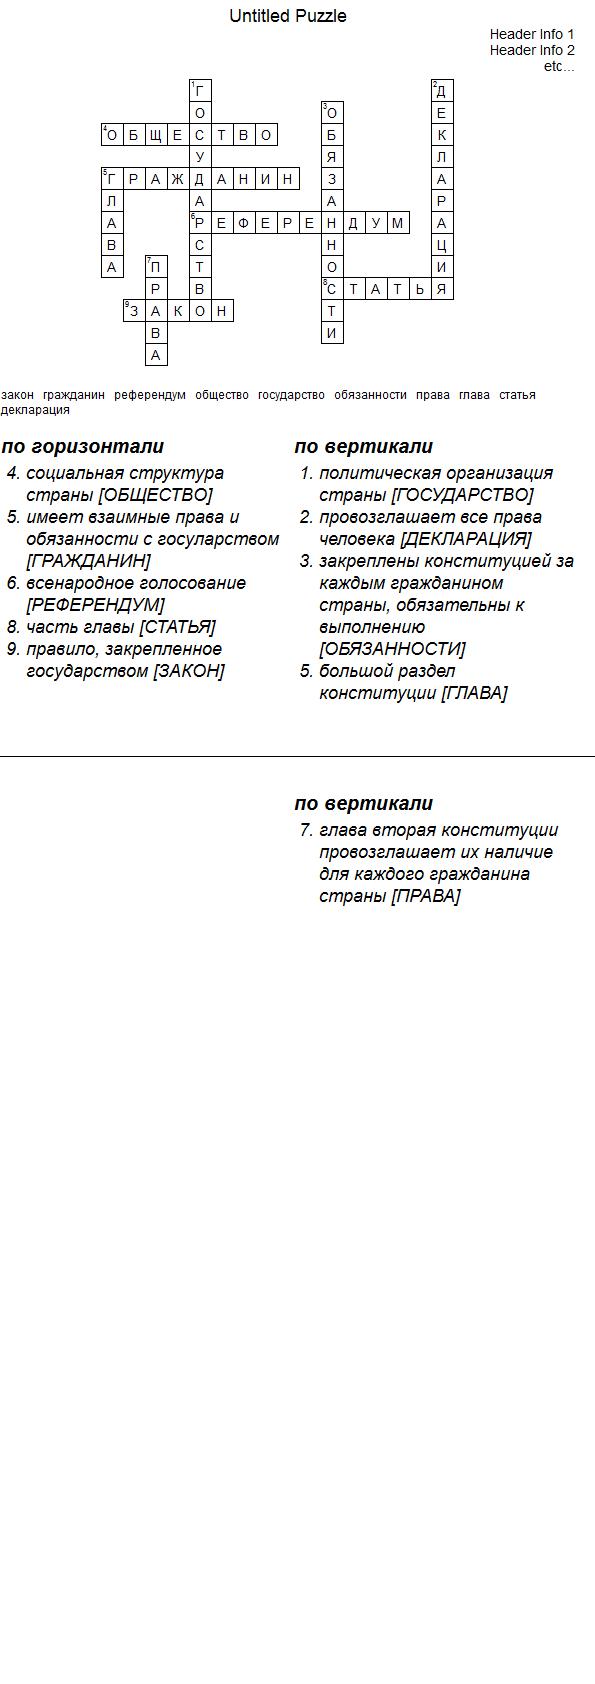 J:\Конституция\Кроссворд\Untitled Puzzle-key (Grid).bmp